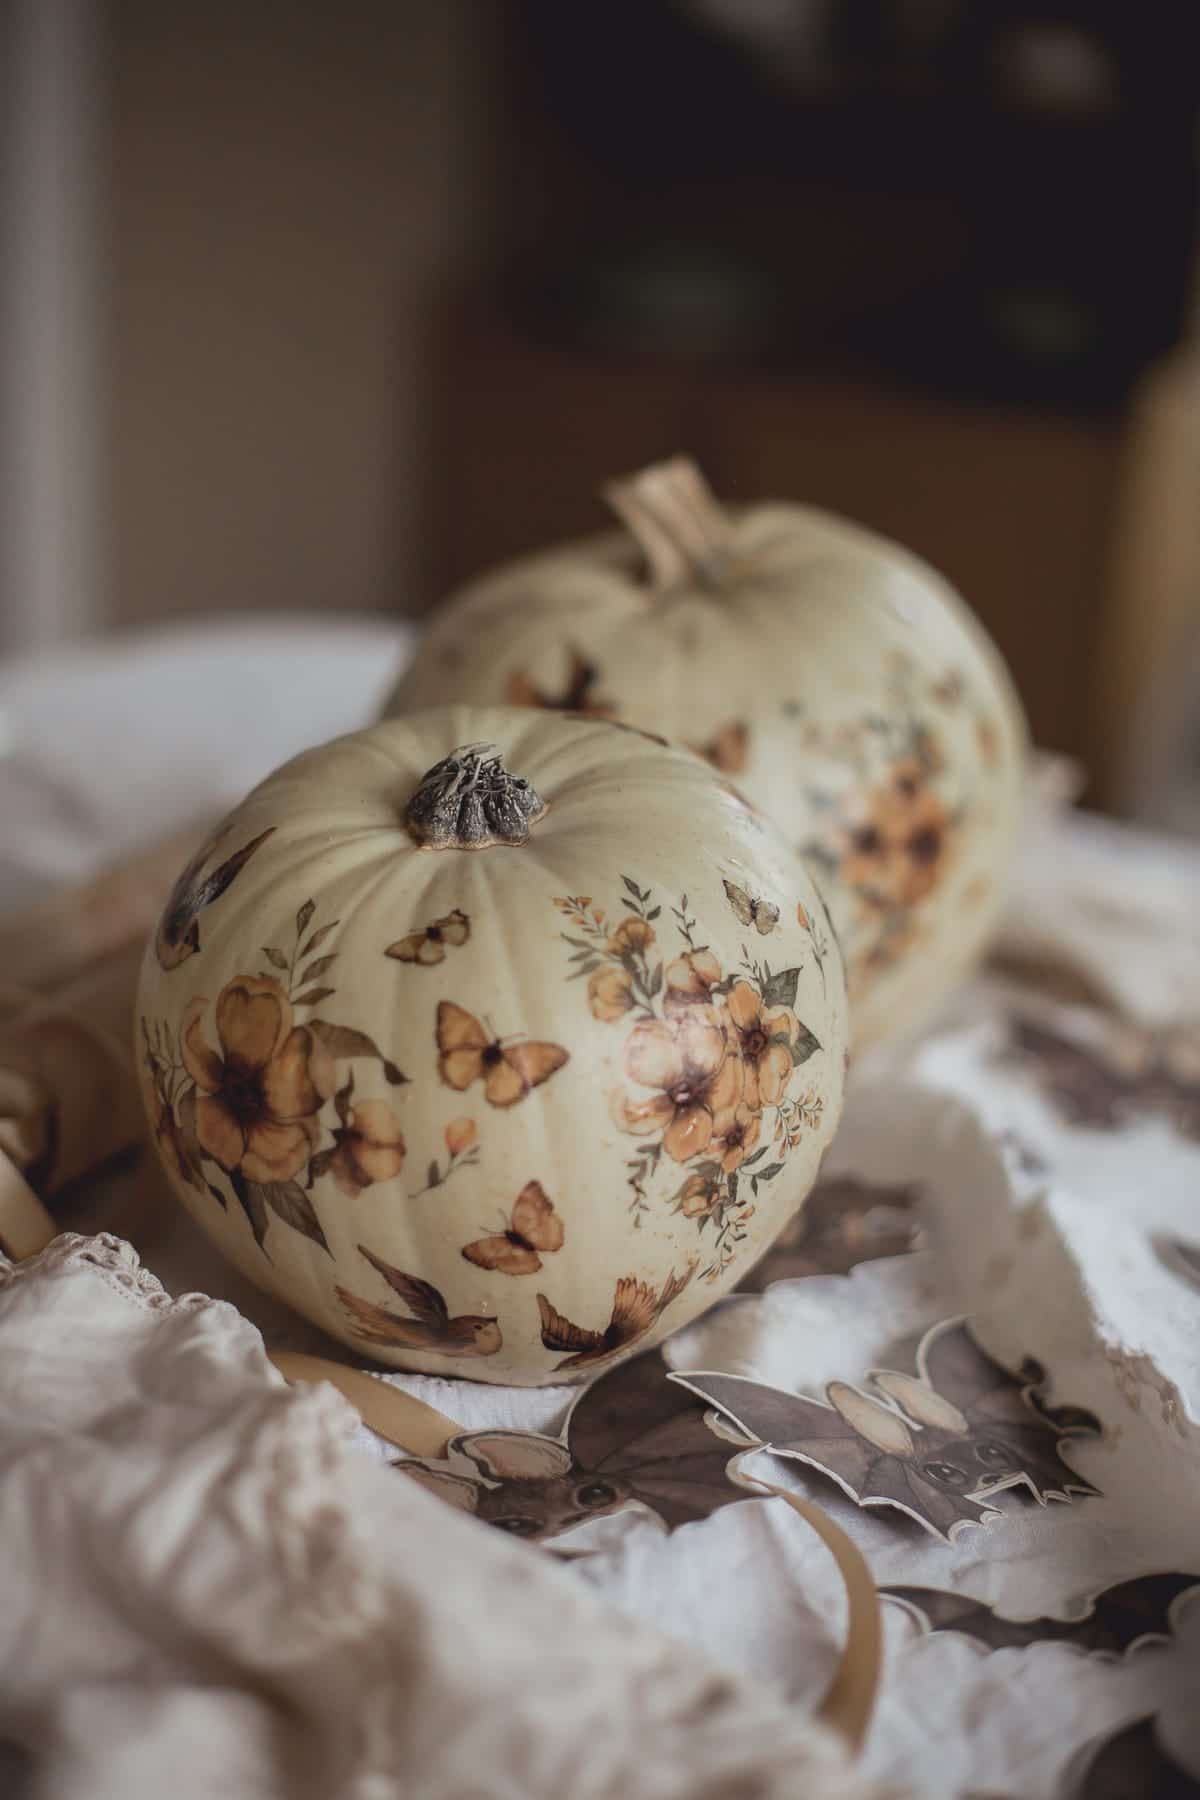 Pumpkin_decoration_temporary_tattoos_craft_halloween